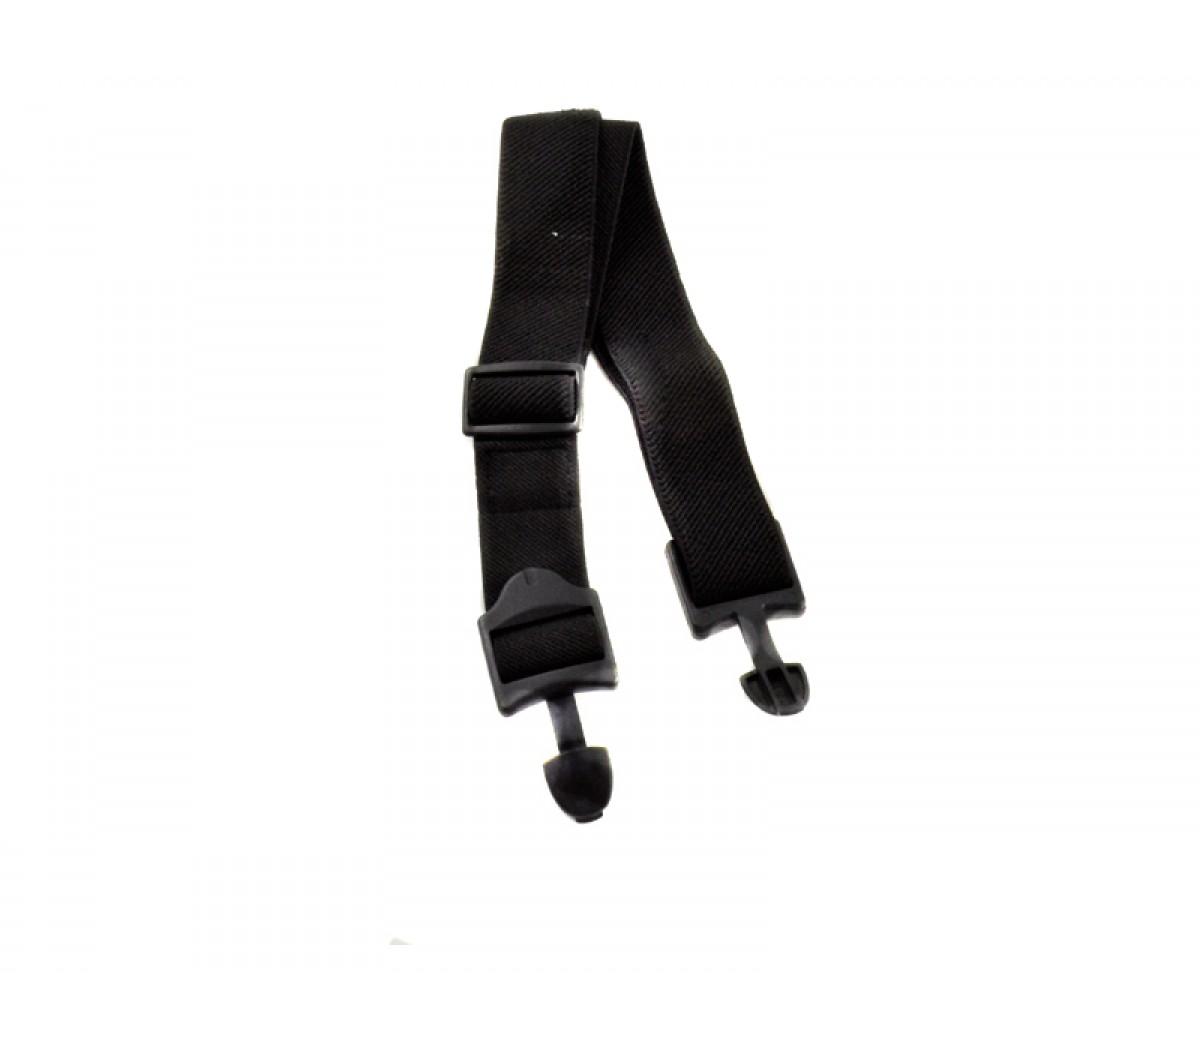 Hartslagmeterdl Sigma/Cardio Elastiek Borstband